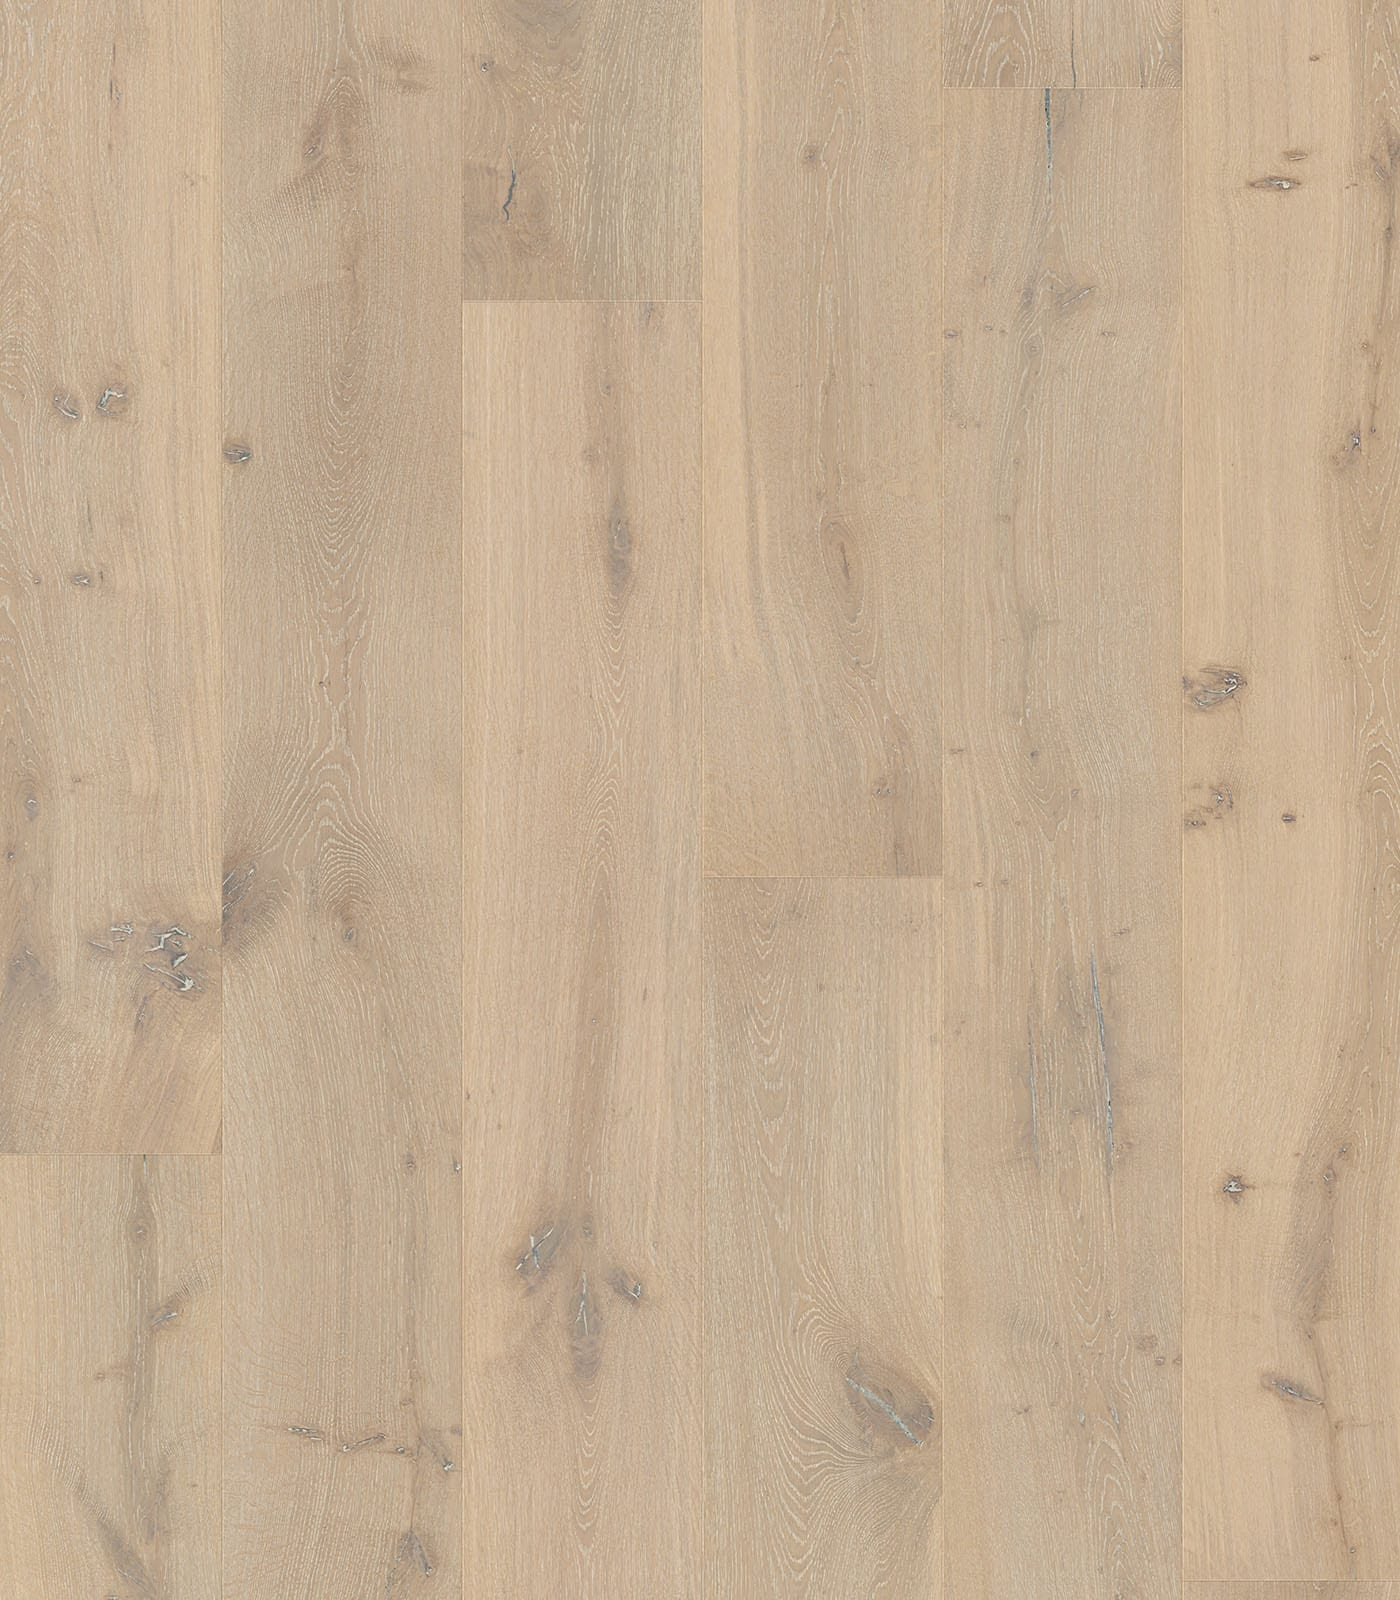 Albatron-Engineered European Oak floors-flat